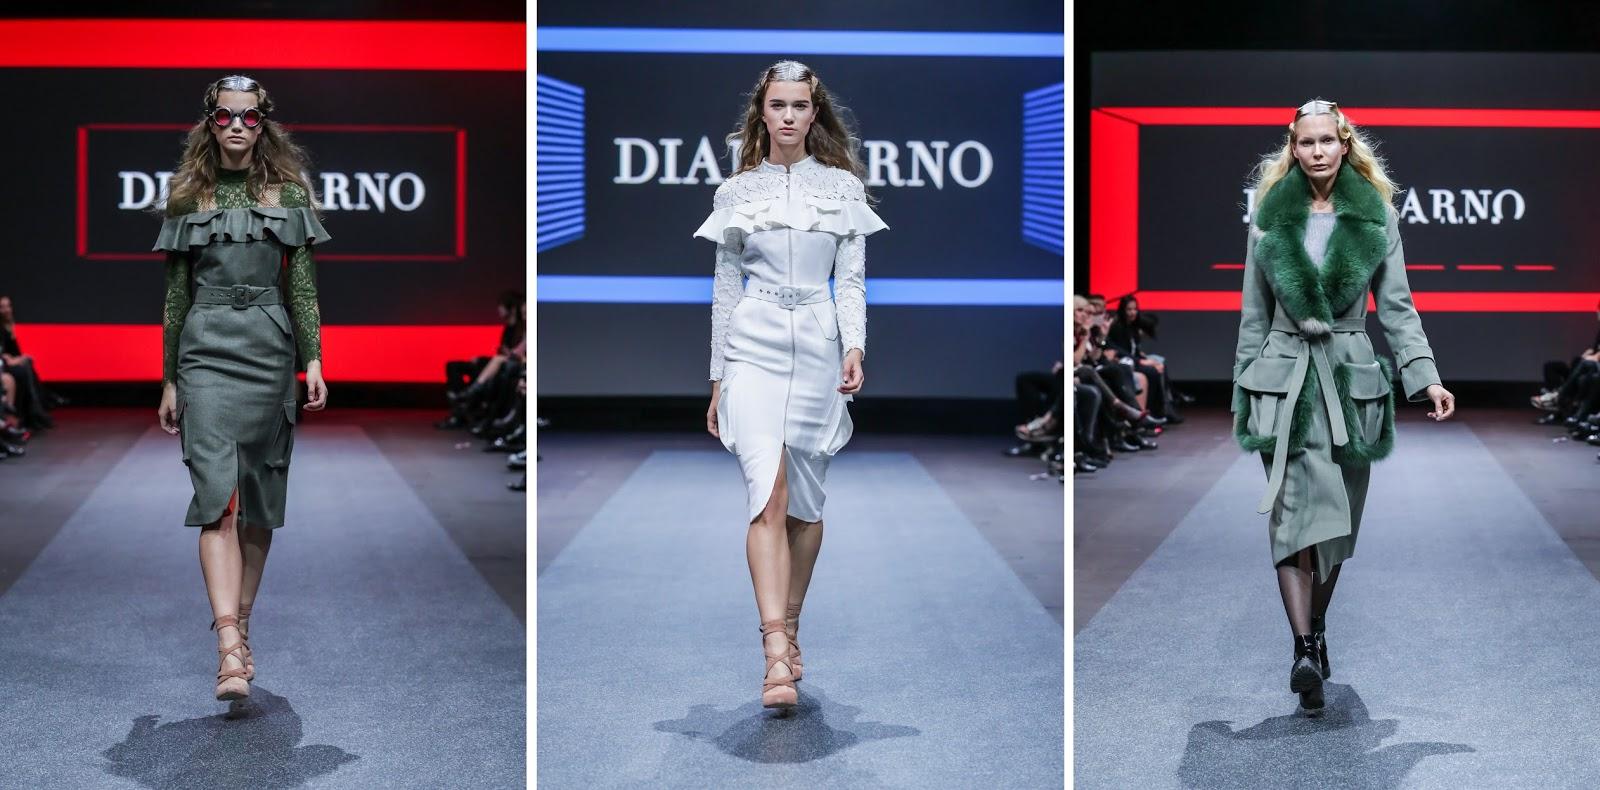 tallinn fashion week 2016 diana arno